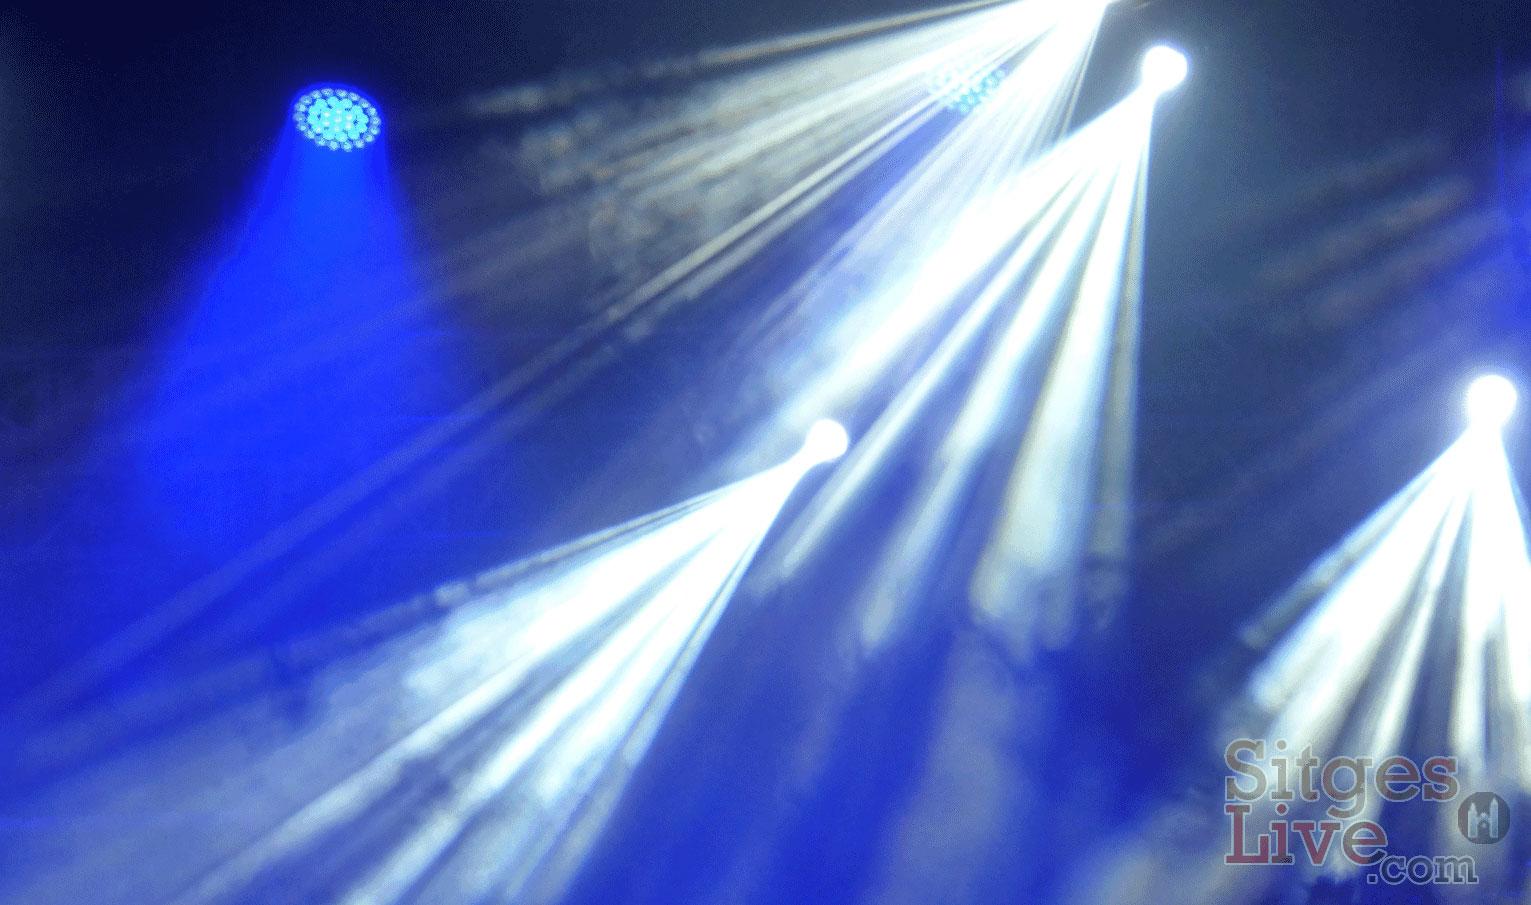 Lighting Technician - Sitges Barcelona